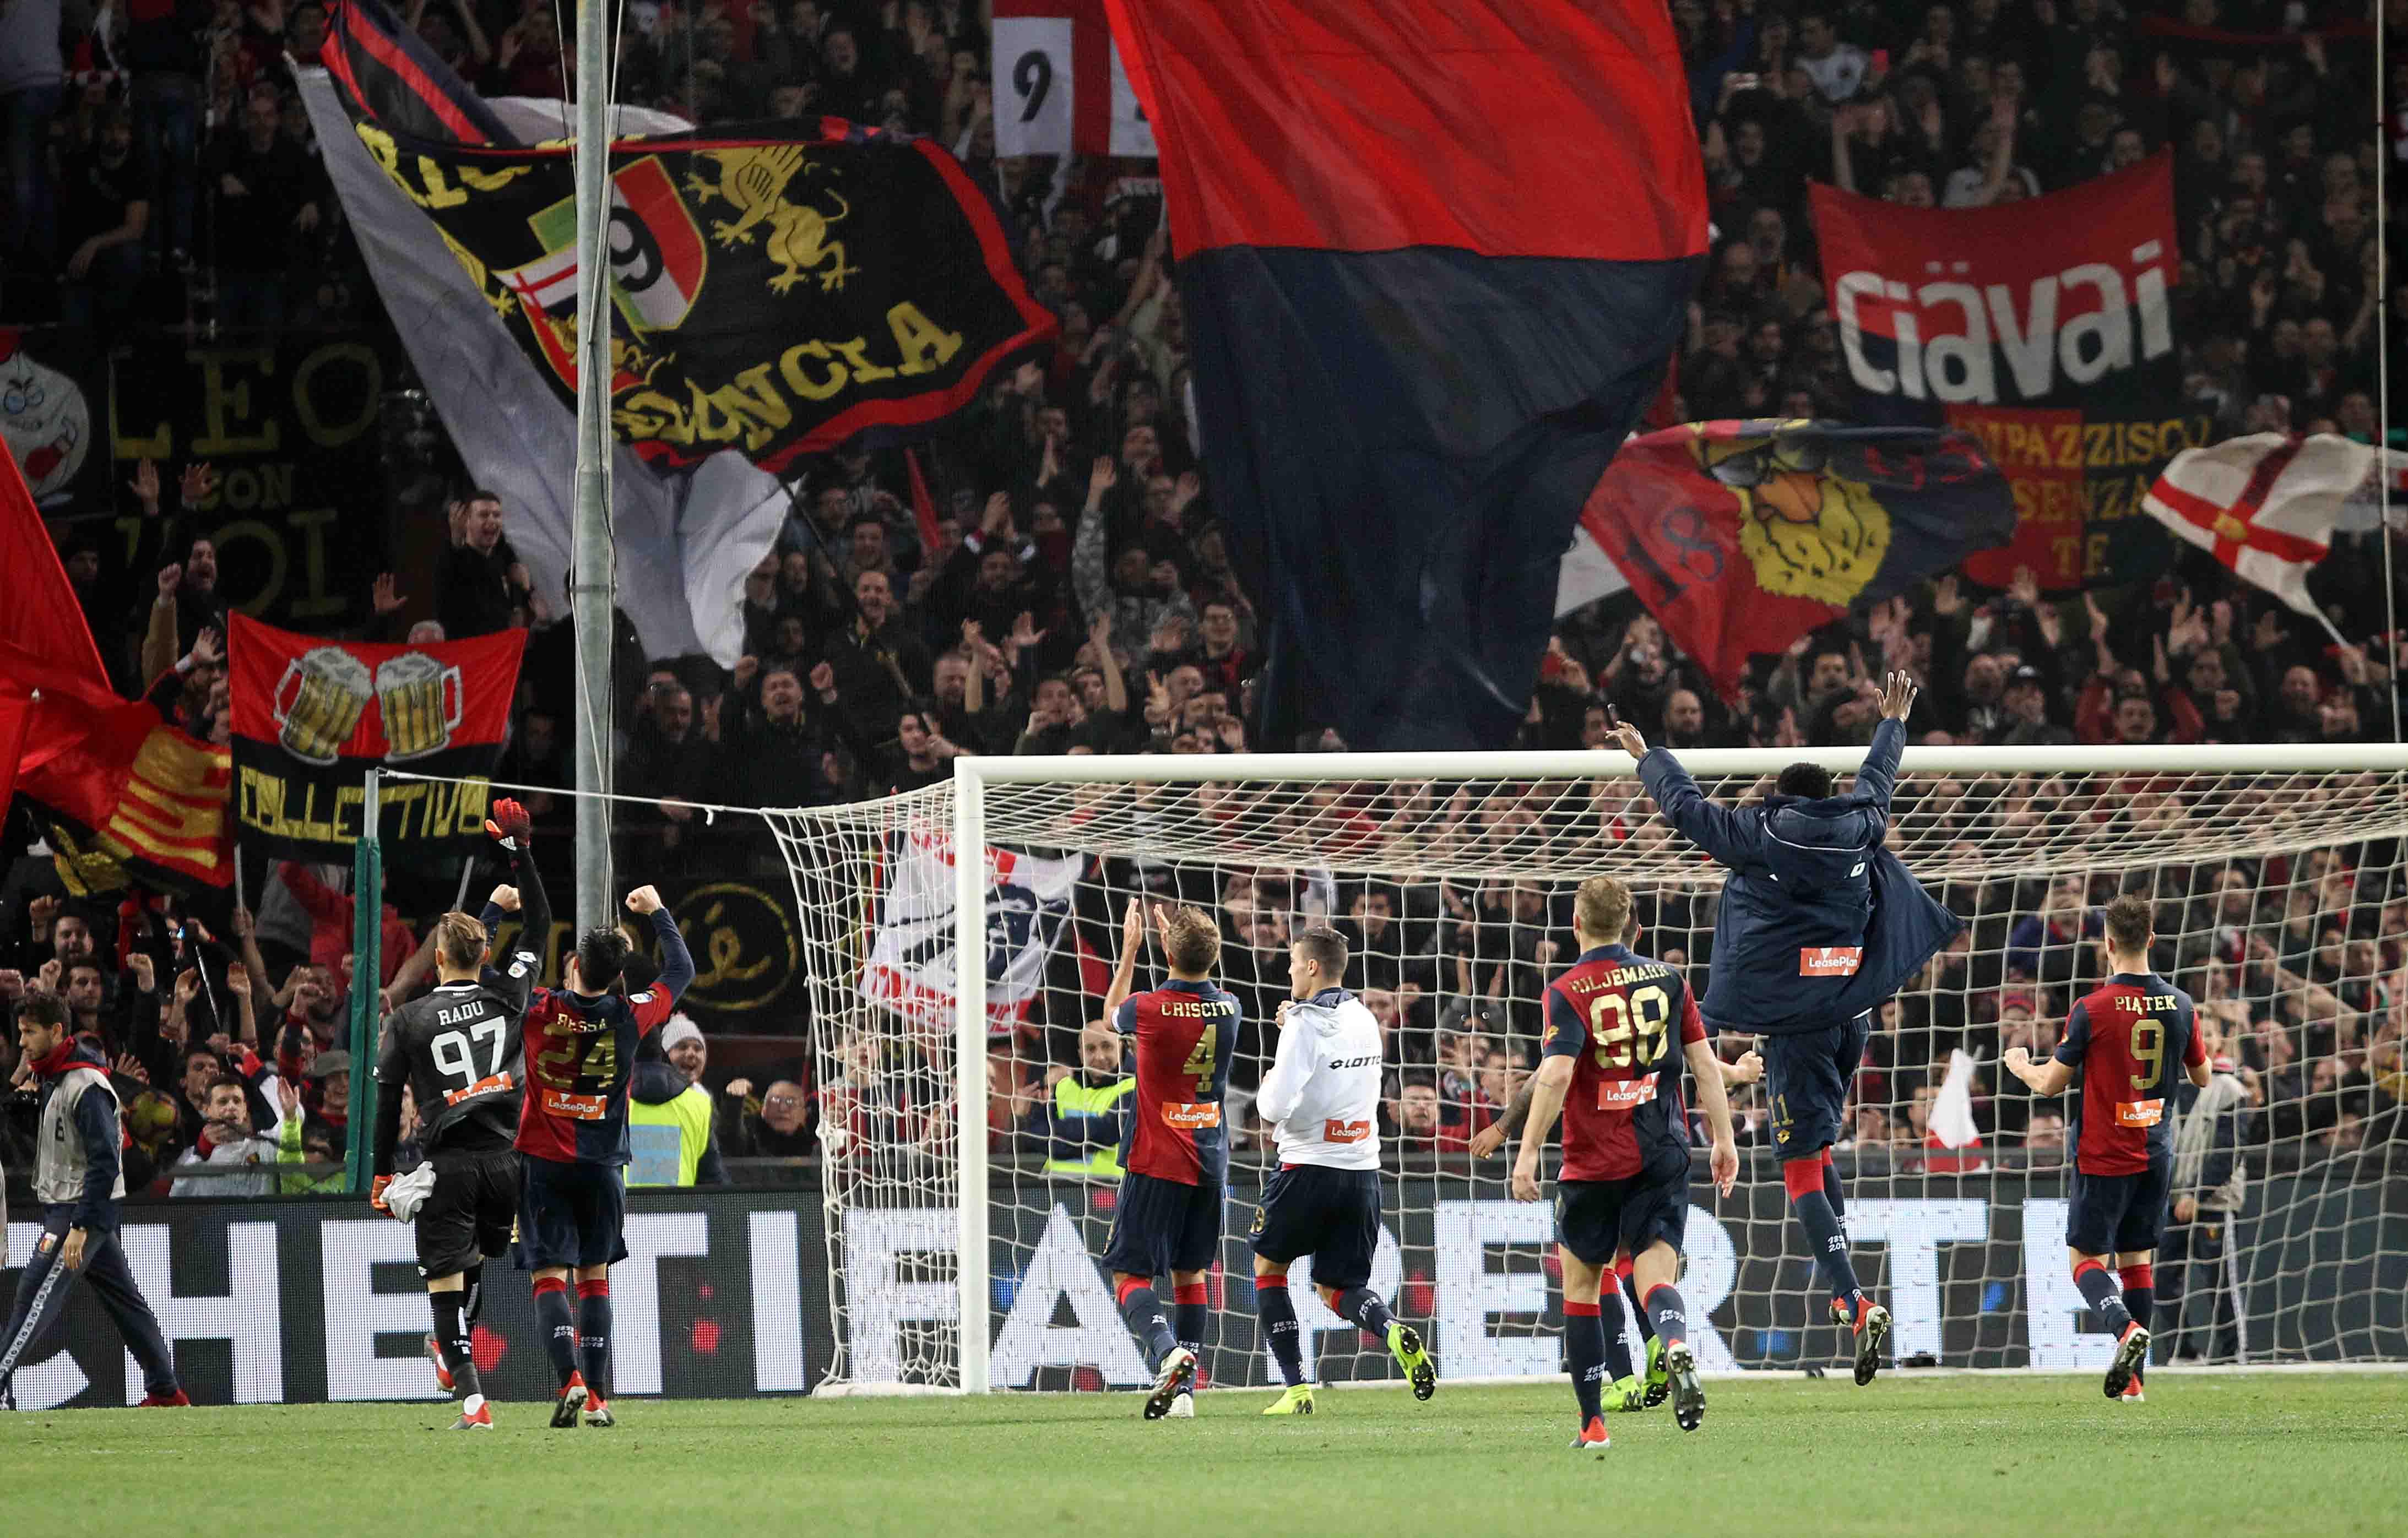 Genoa-Milan alle 15, i tifosi protestano